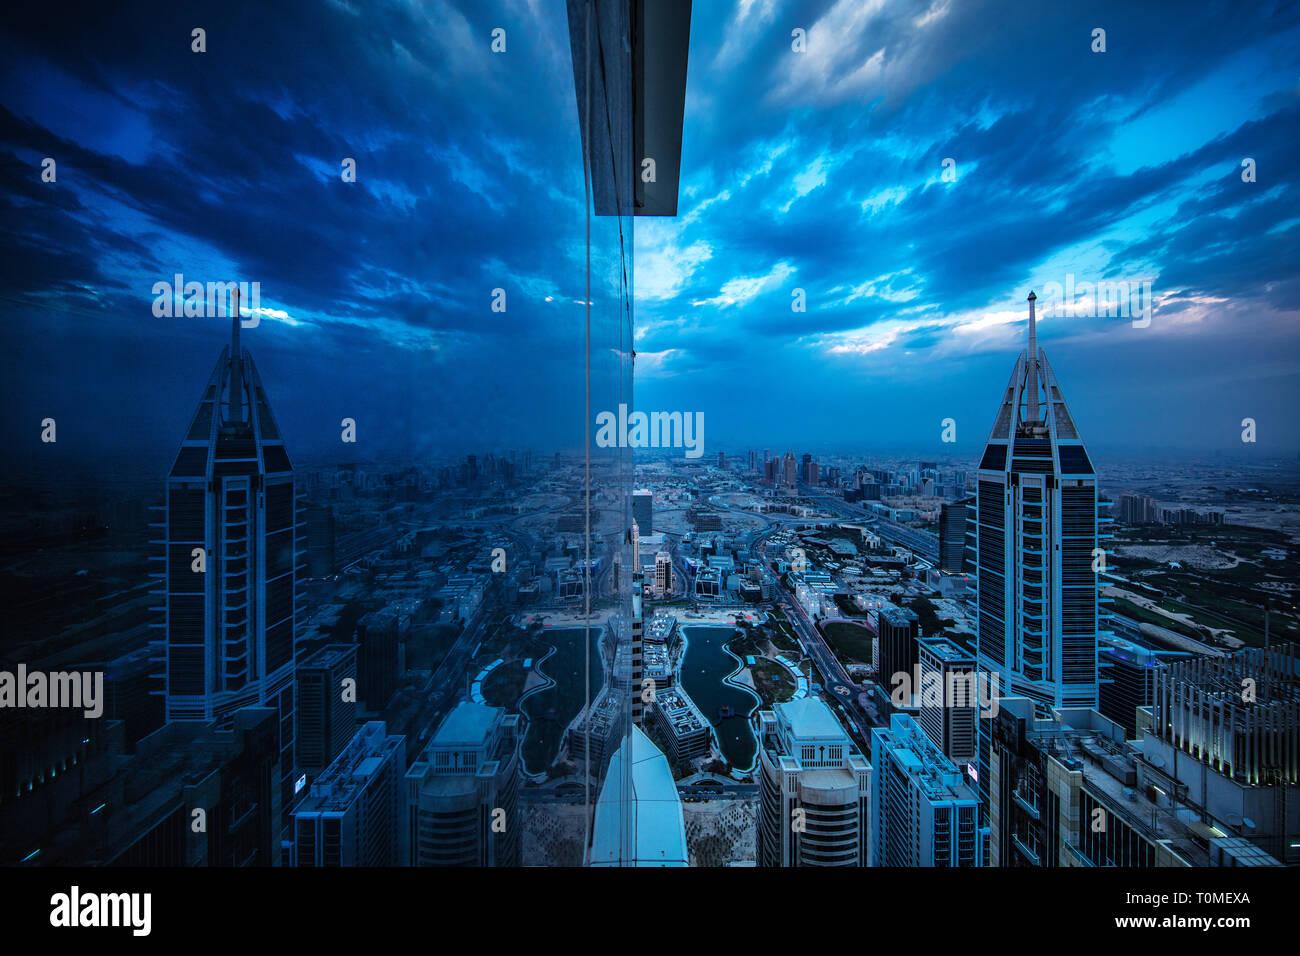 Eine Reflexion der Dubai Marina, Dubai, VAE Stockfoto